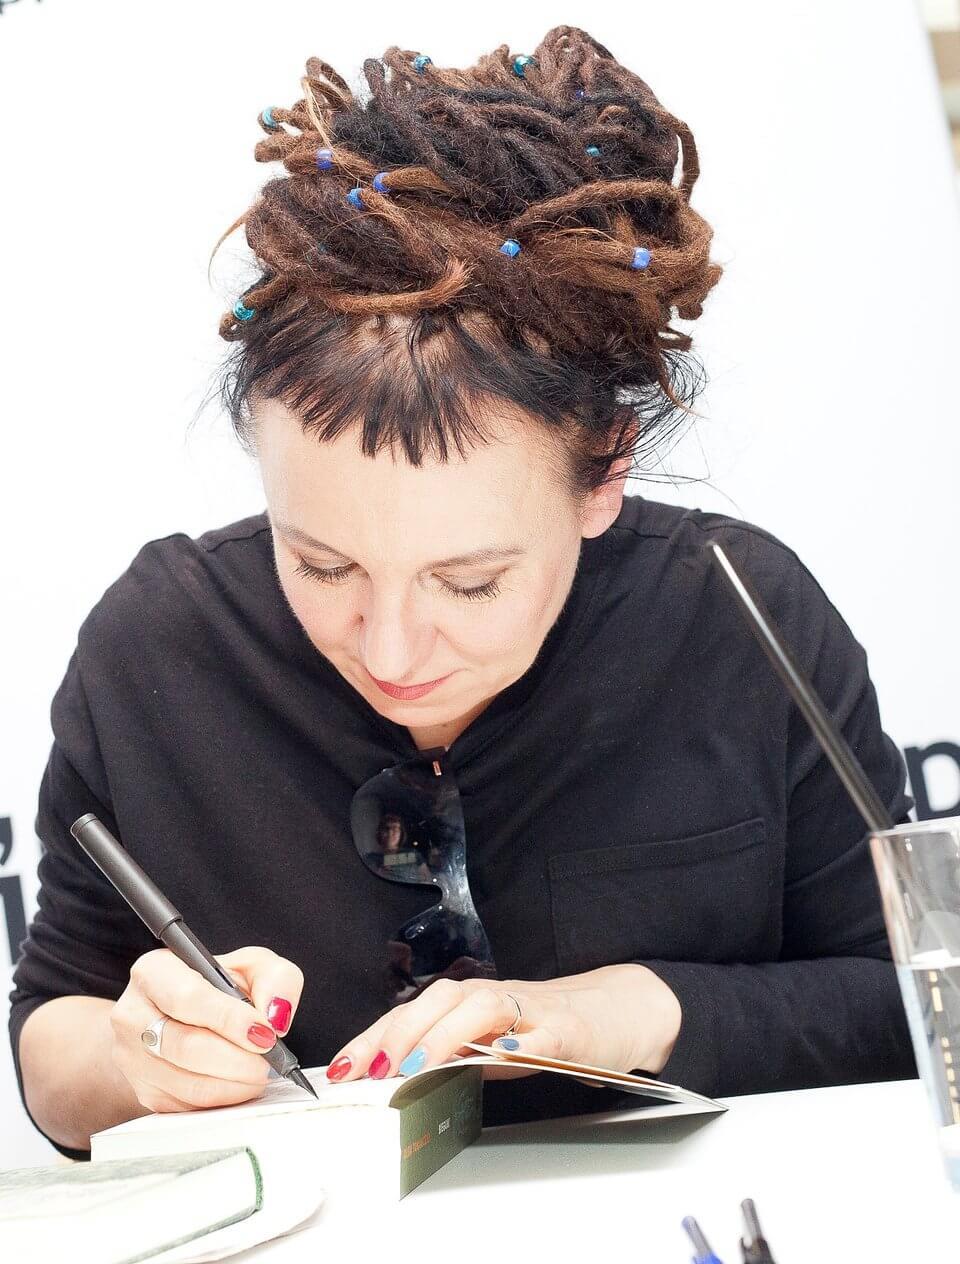 Olga Tokarczuk podpisująca książki